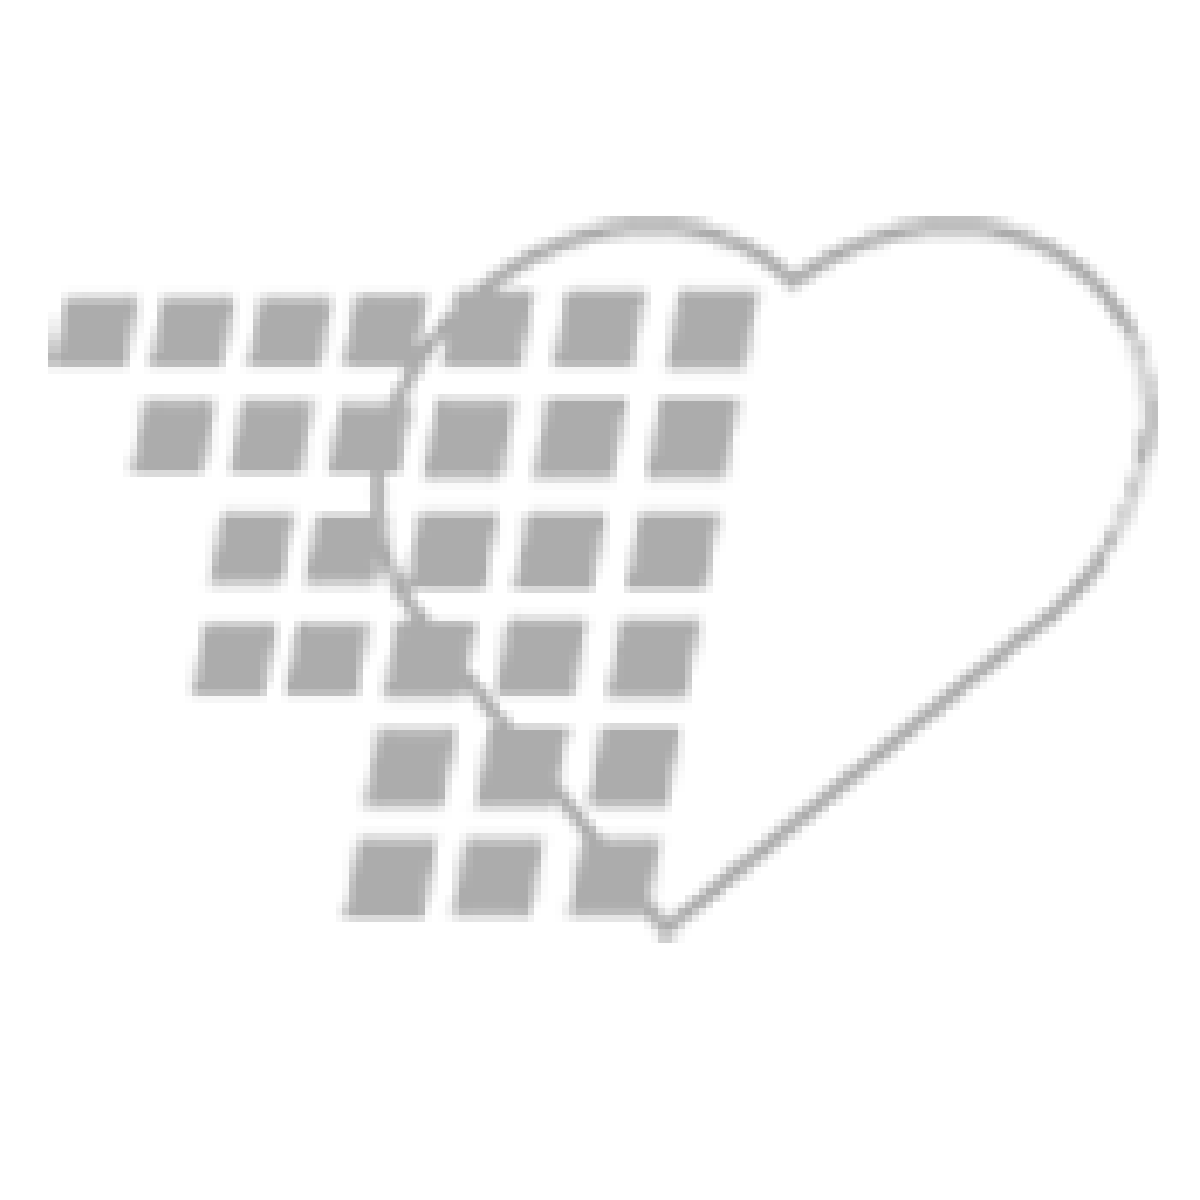 03-32-5610 PDI® Bracket for Super Sani-Cloth Wipes